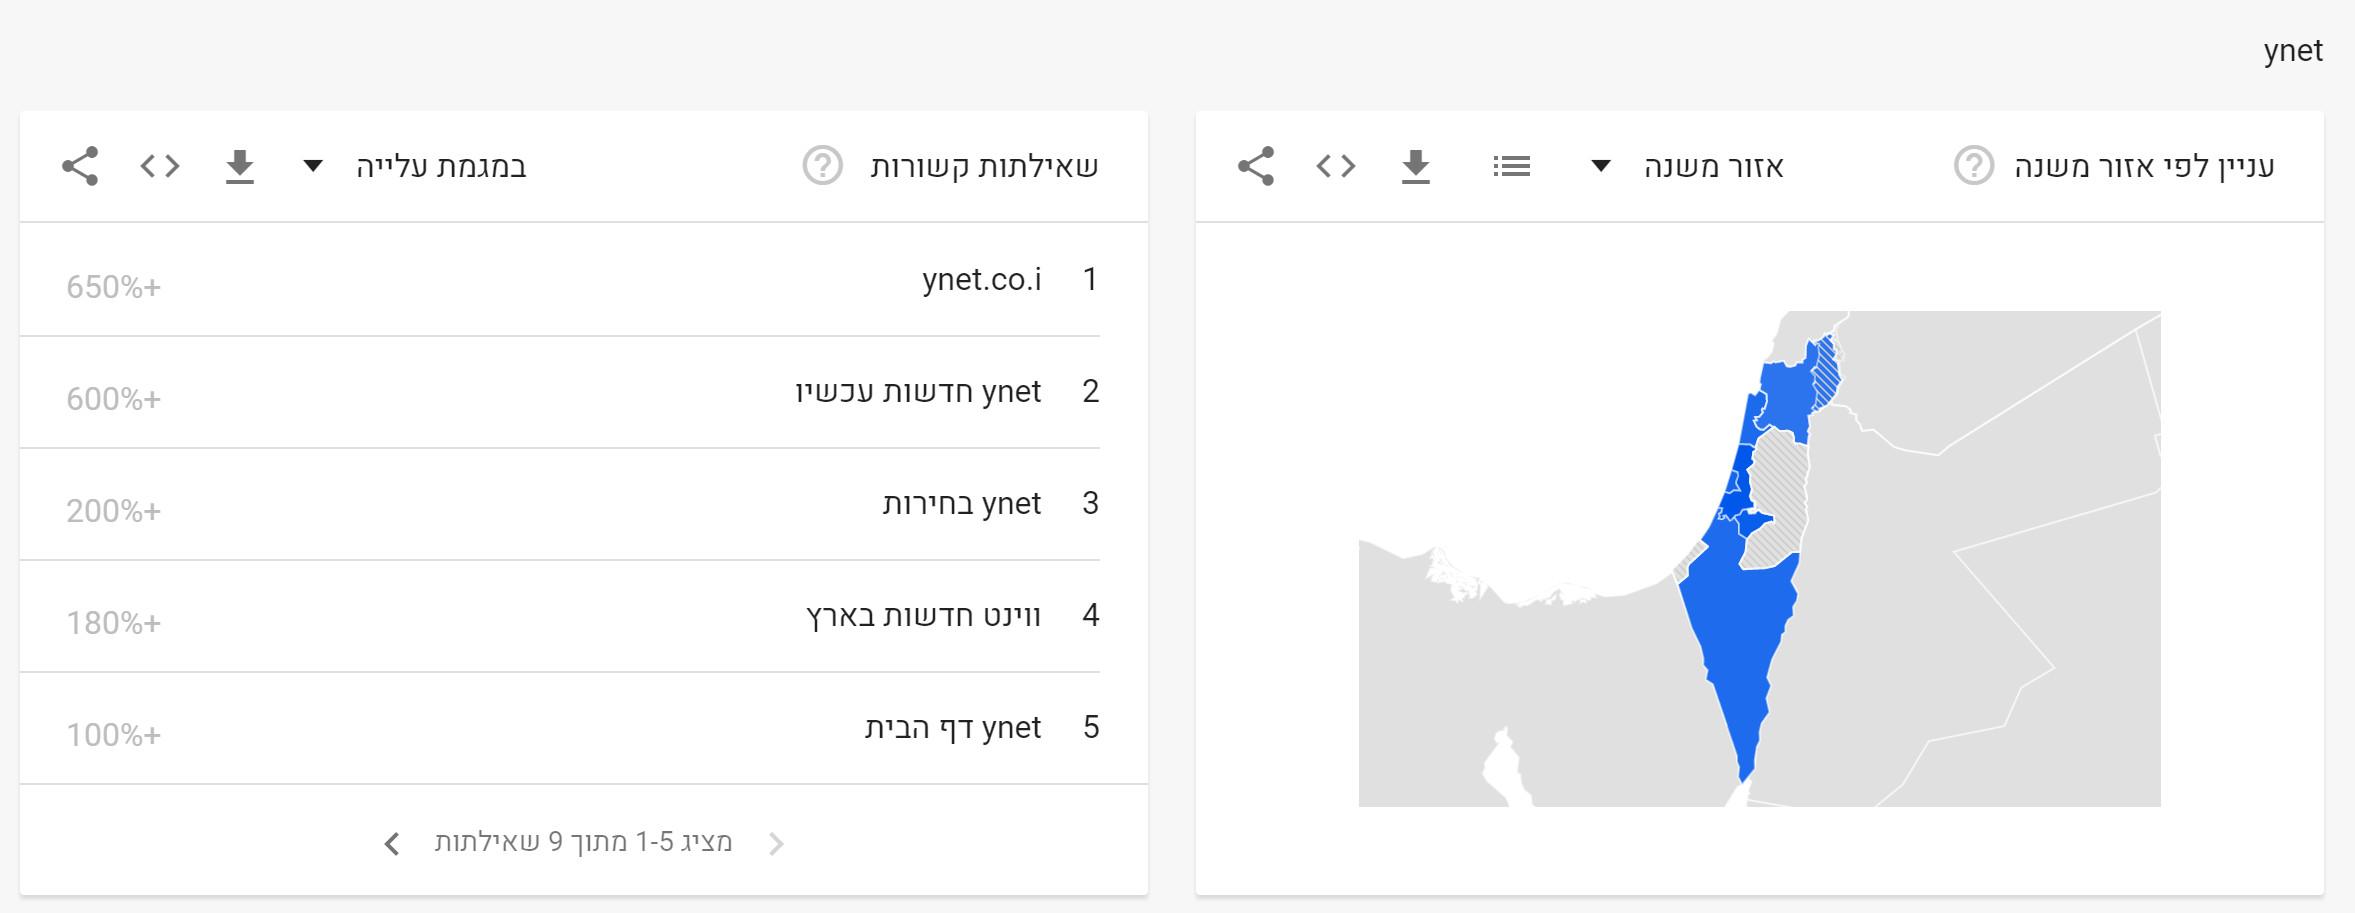 News 2019 in Google (3)